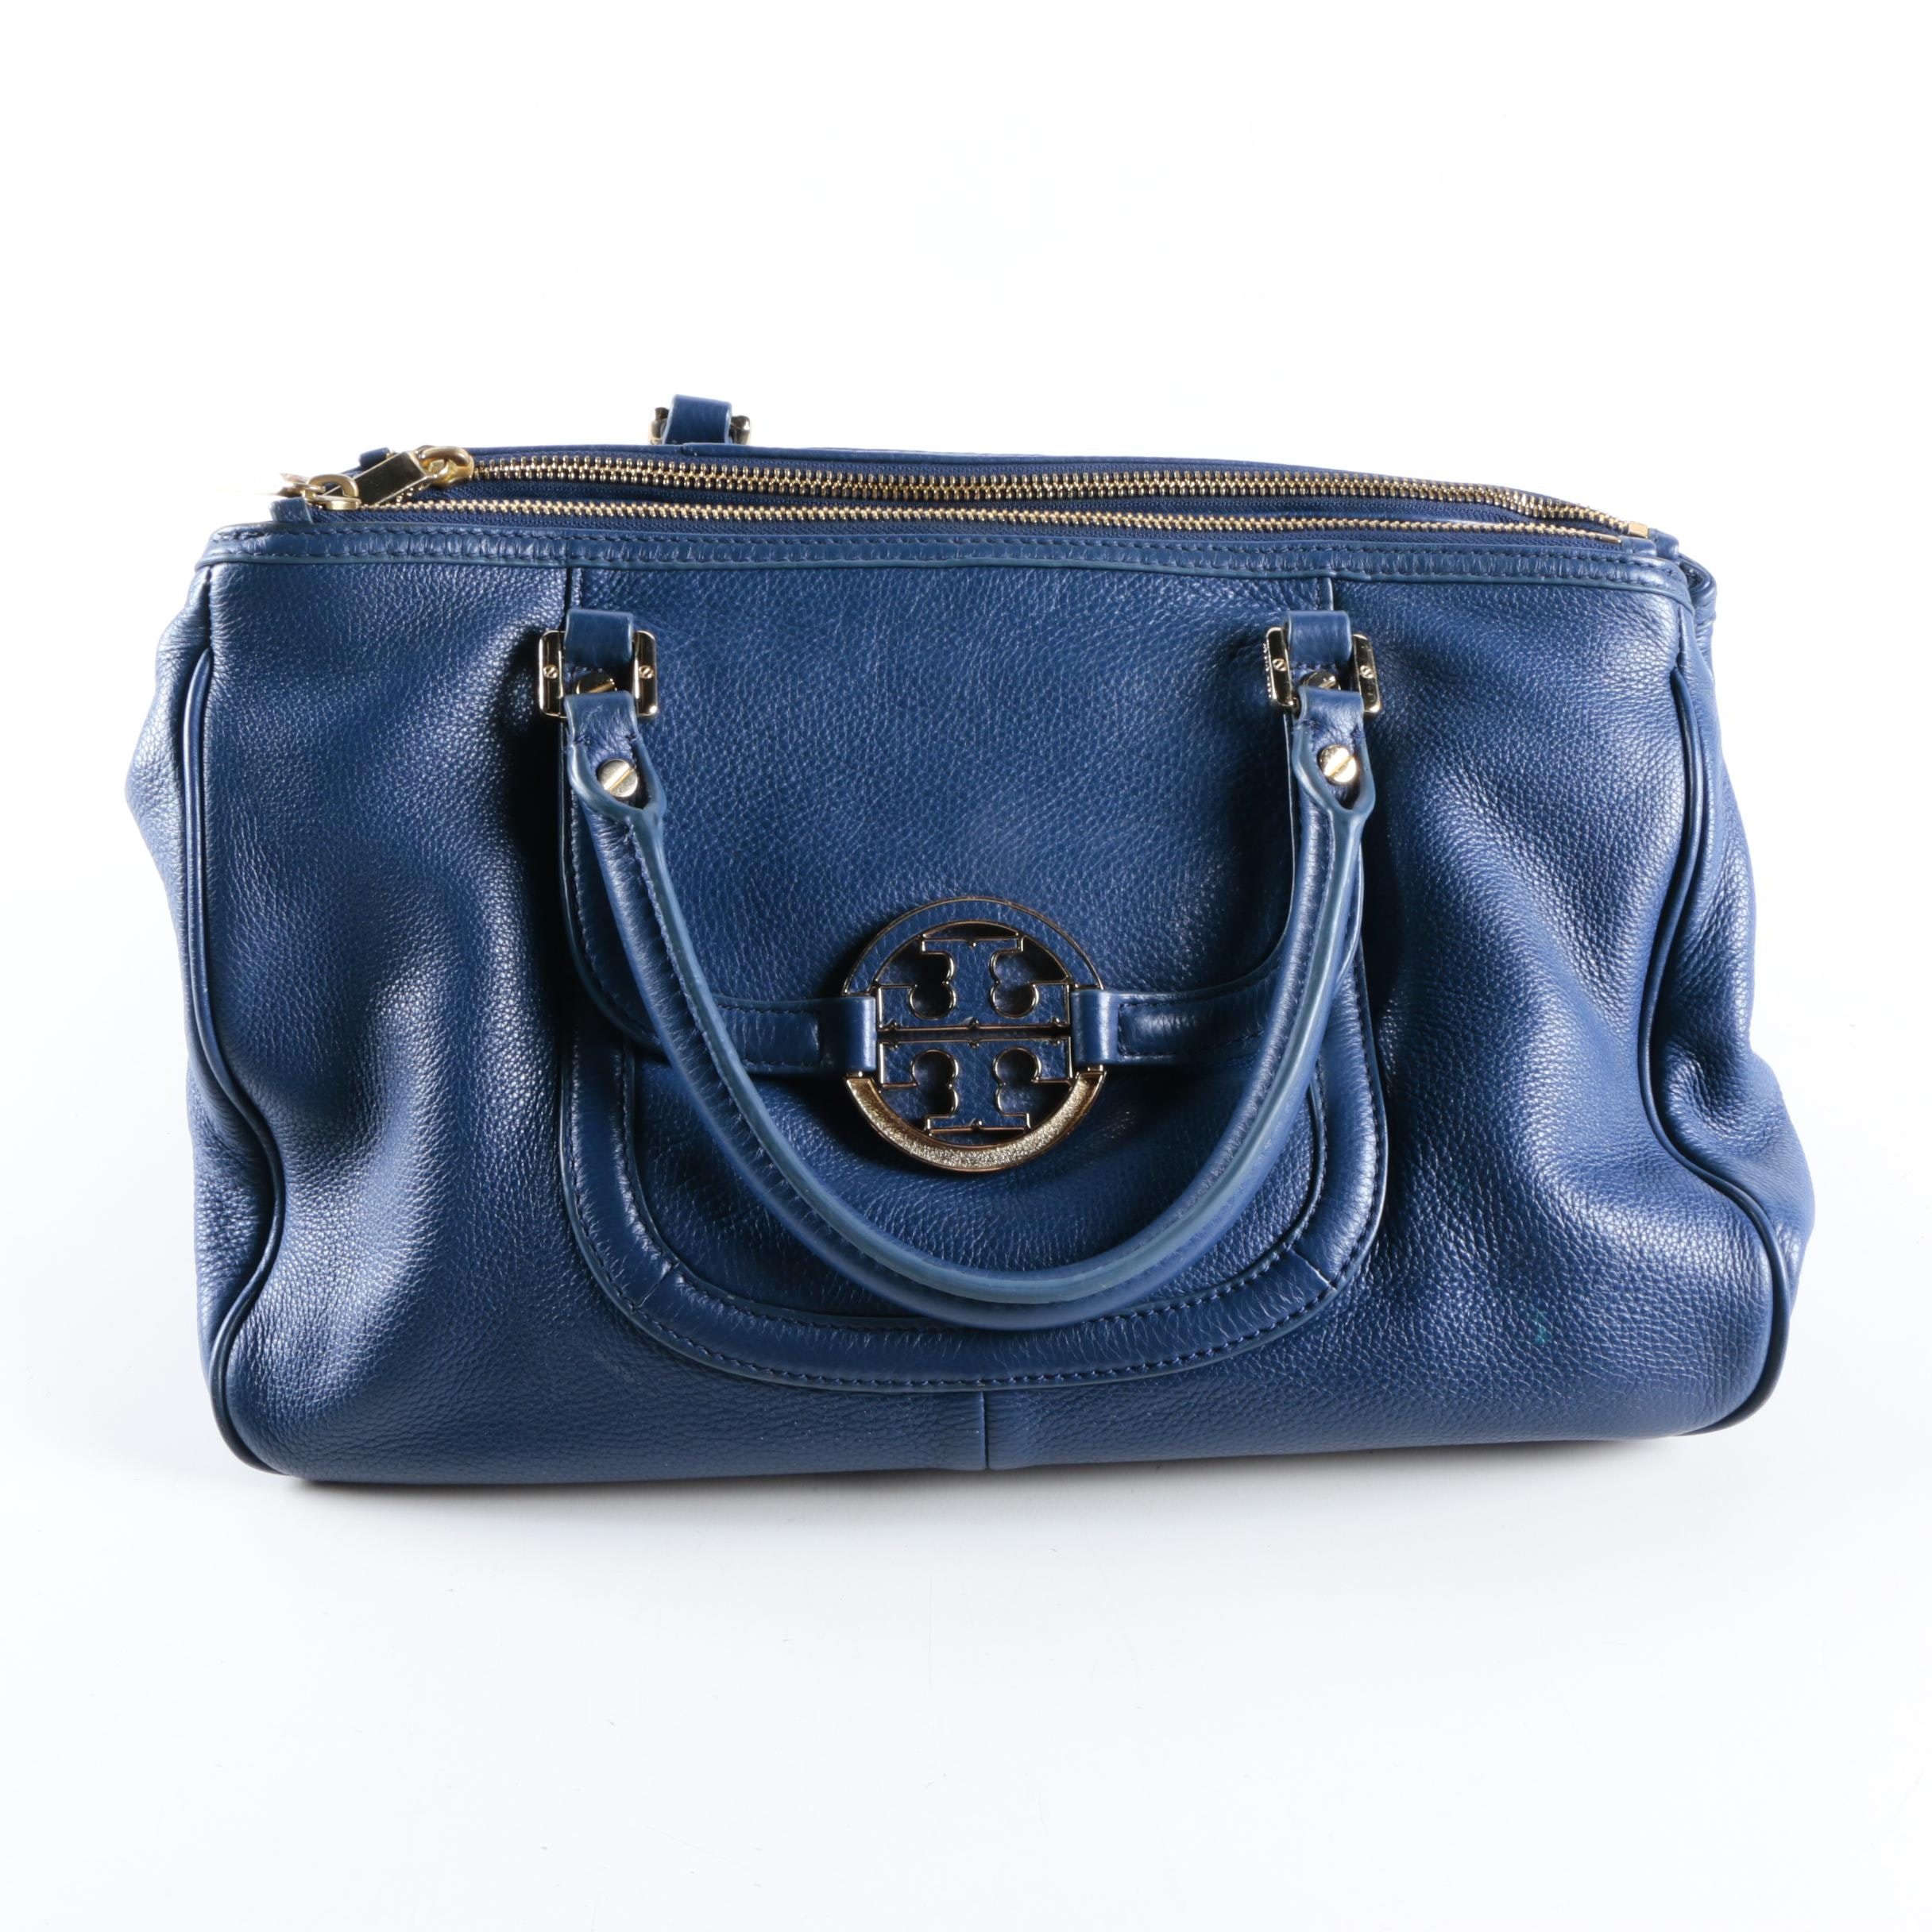 Tory Burch Pebbled Leather Handbag